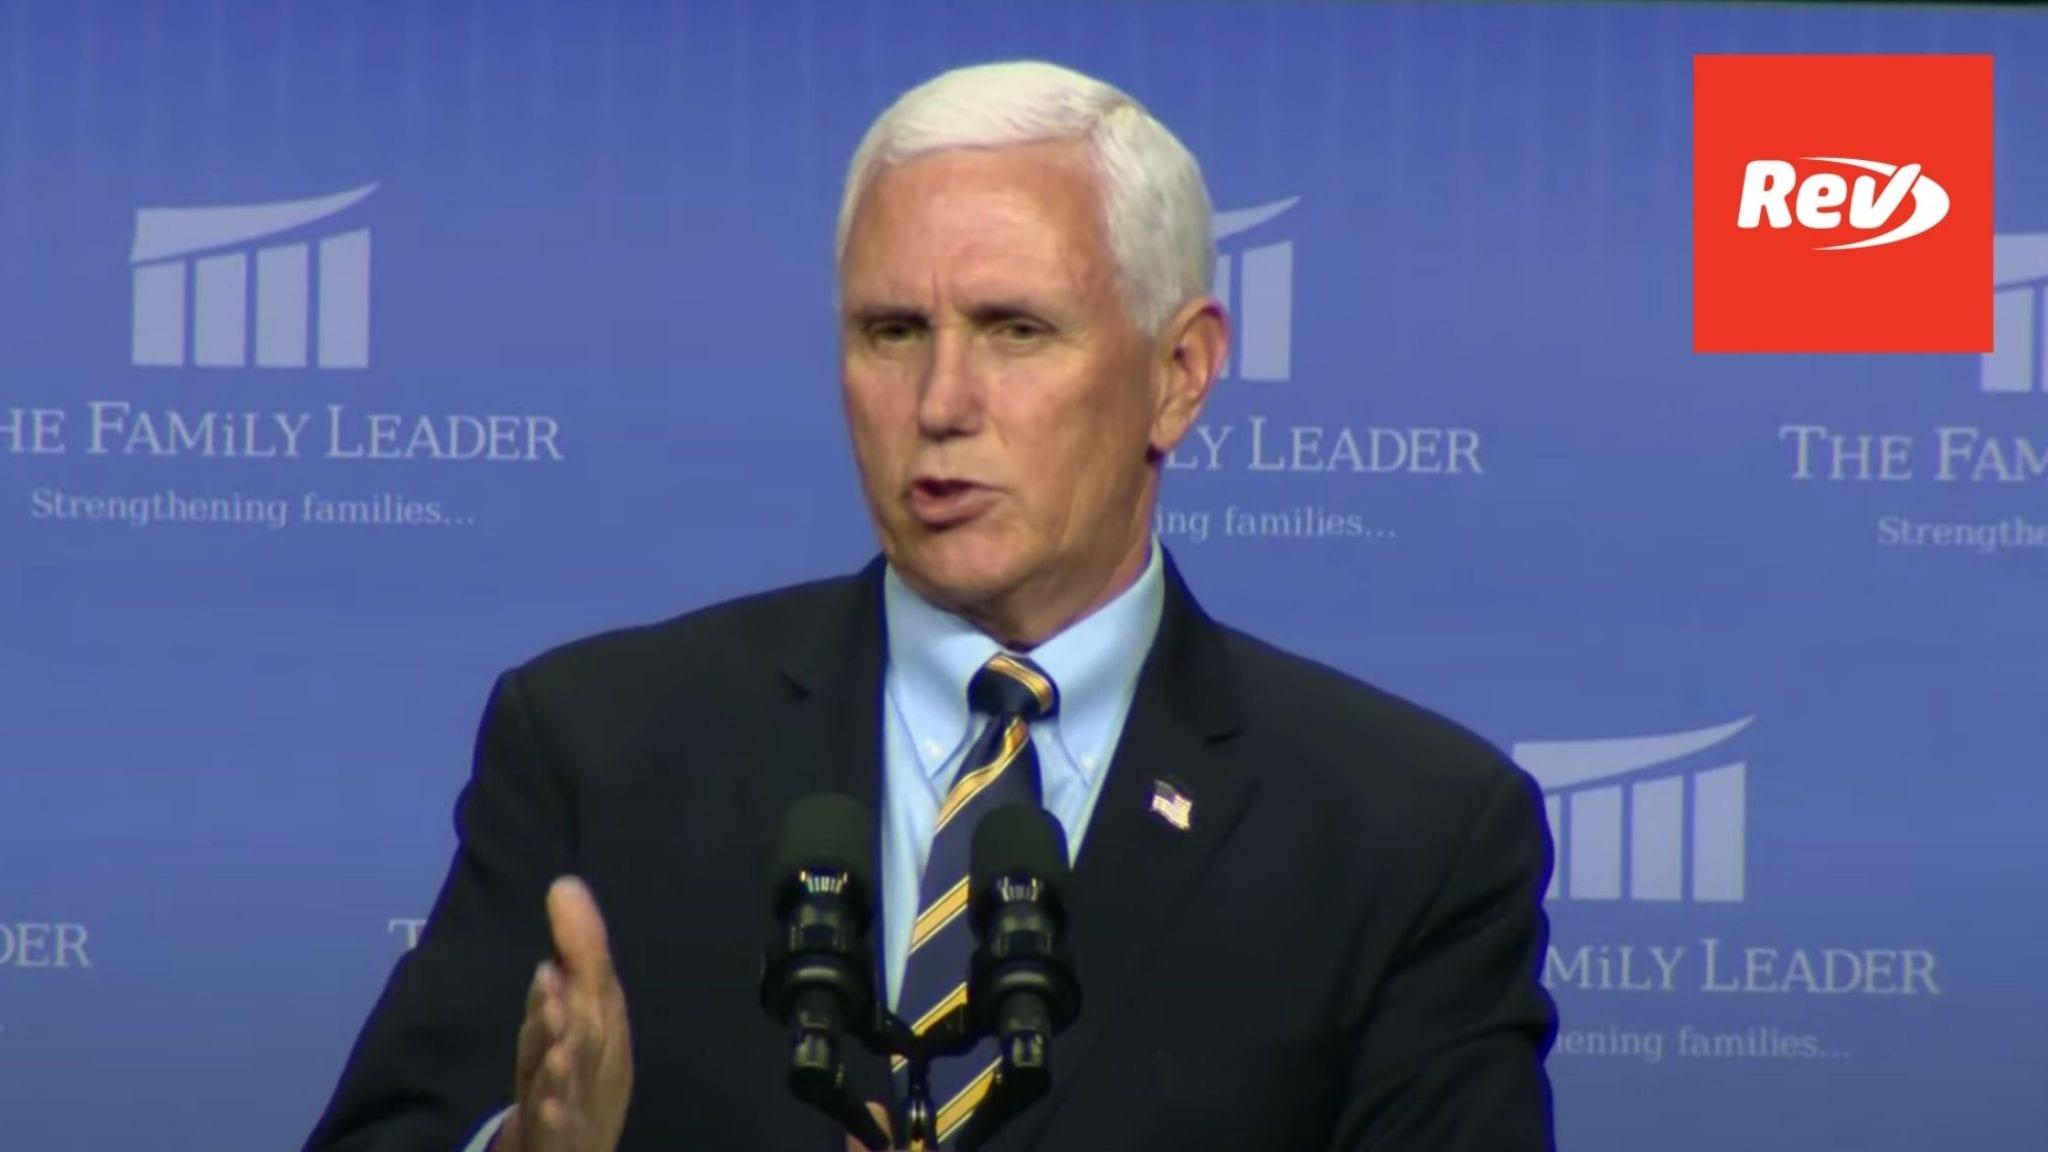 Mike Pence 'Faith in Leadership' Speech Transcript October 1